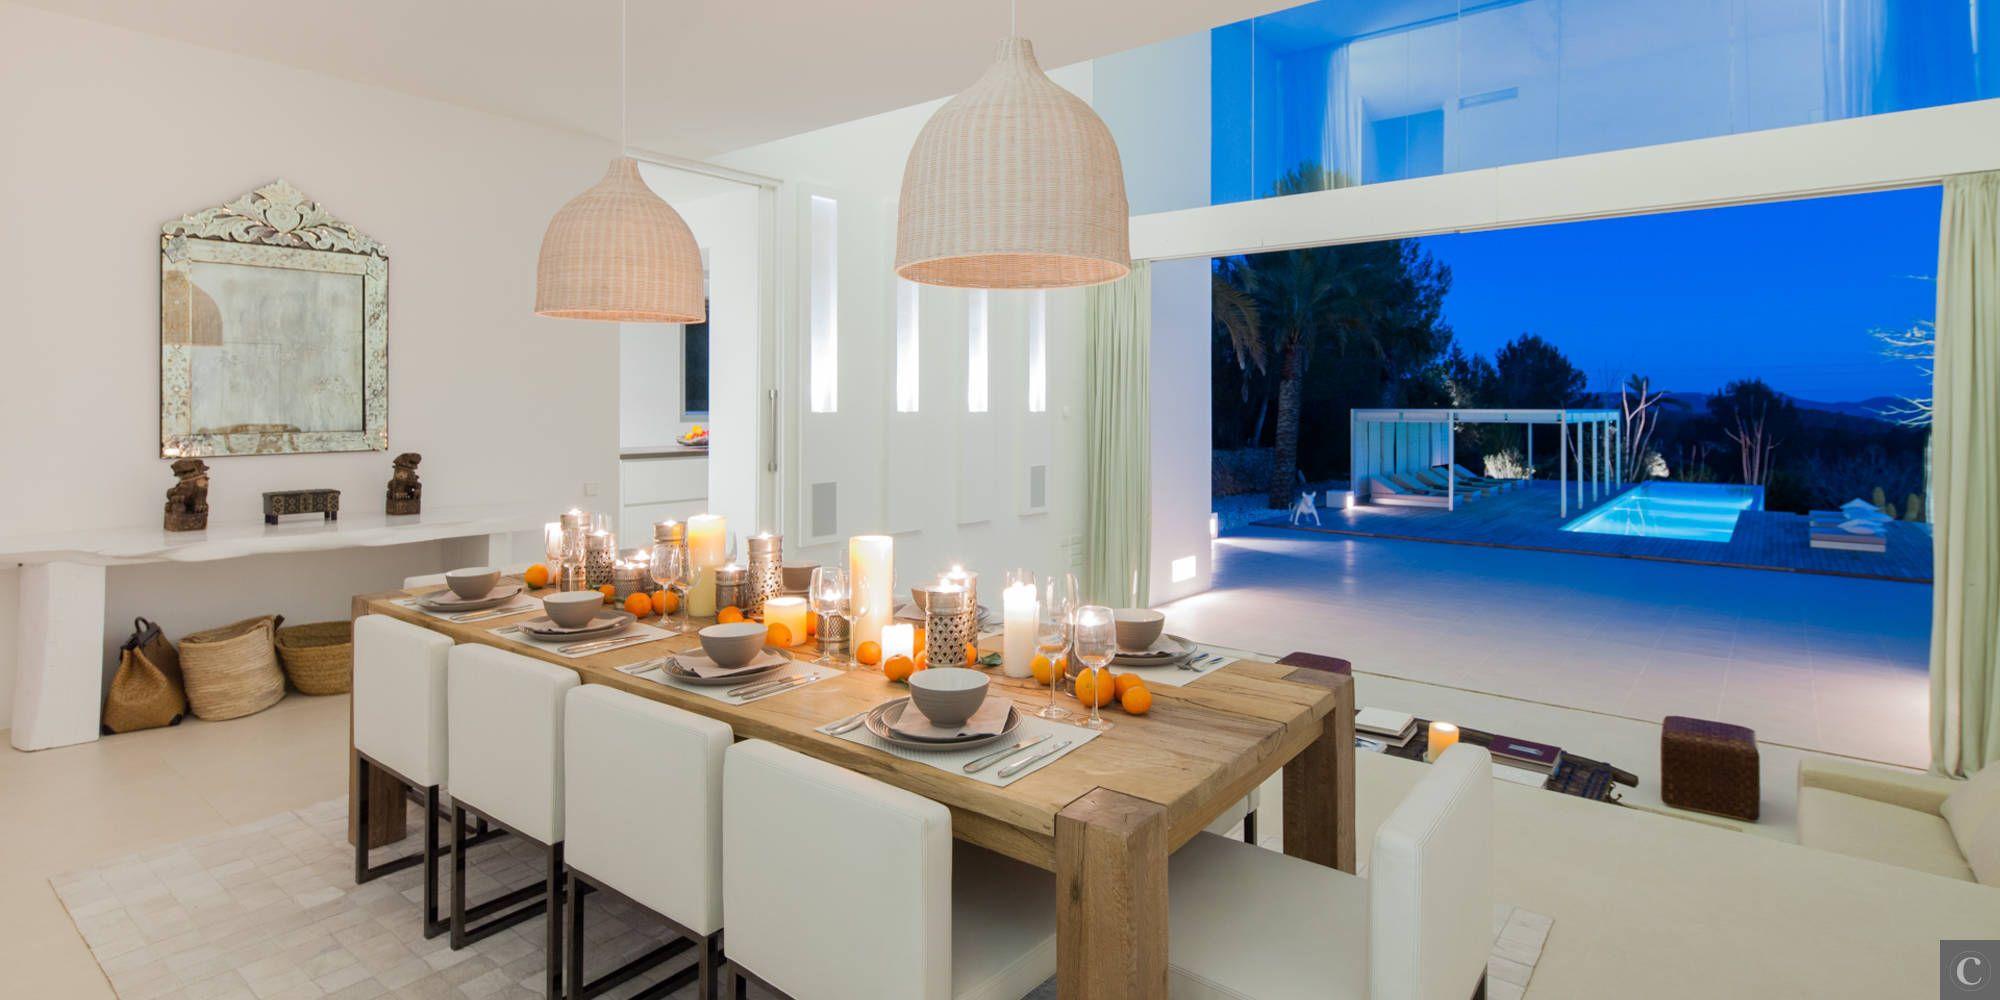 Location de demeure  Ibiza Espagne